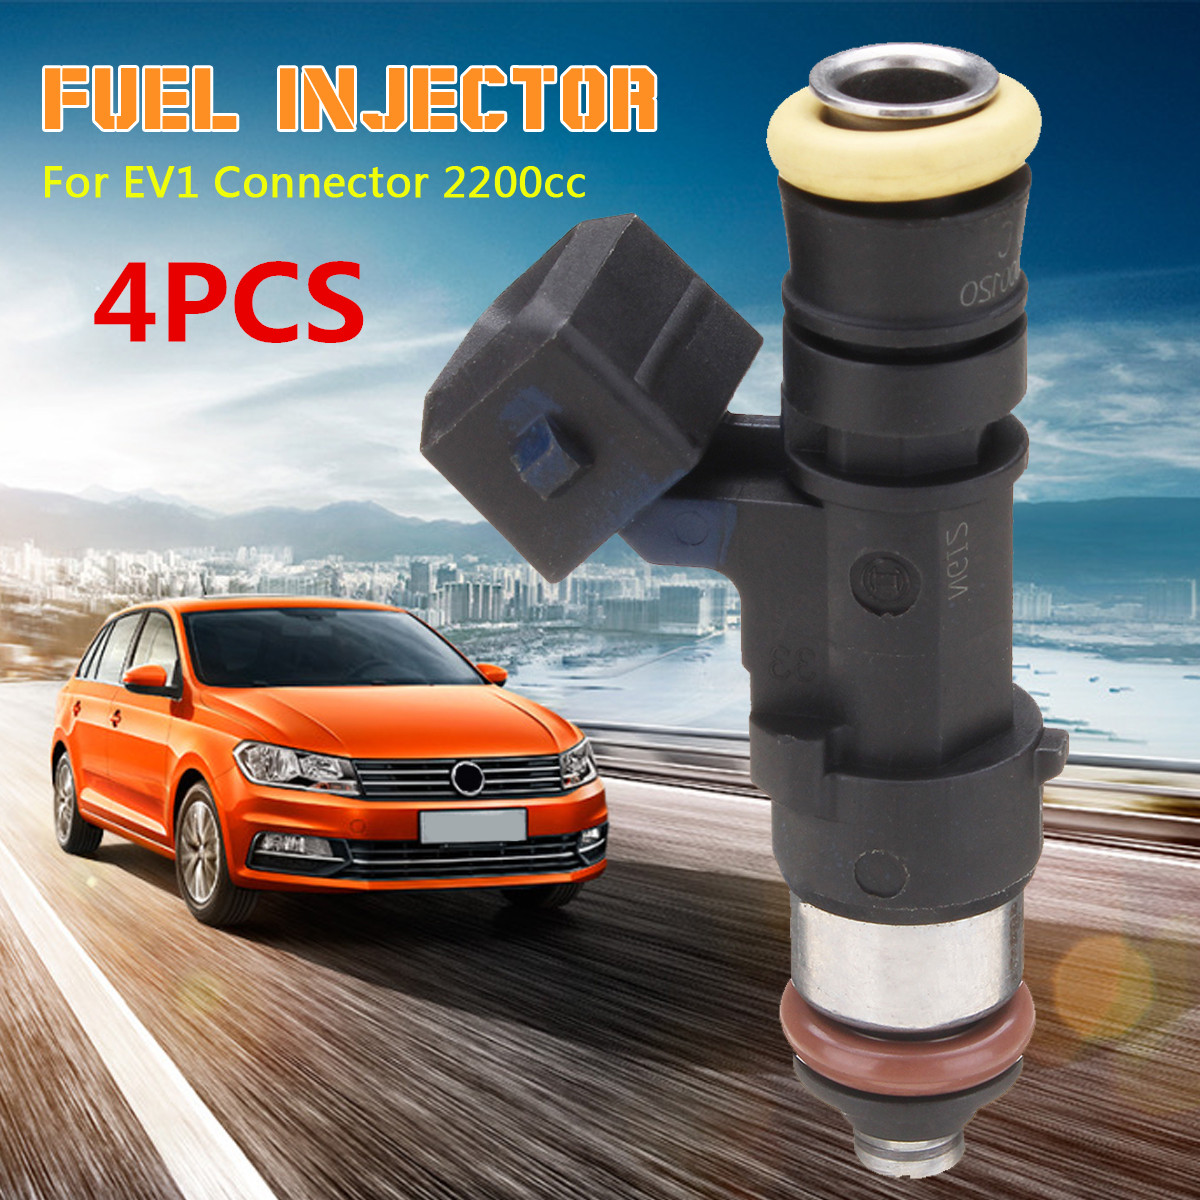 Autoleader 4Pcs Black High Impedance Fuel Injector for EV1 Connector 2200cc Auto Replacement Parts Plastic 65x14mm Universal